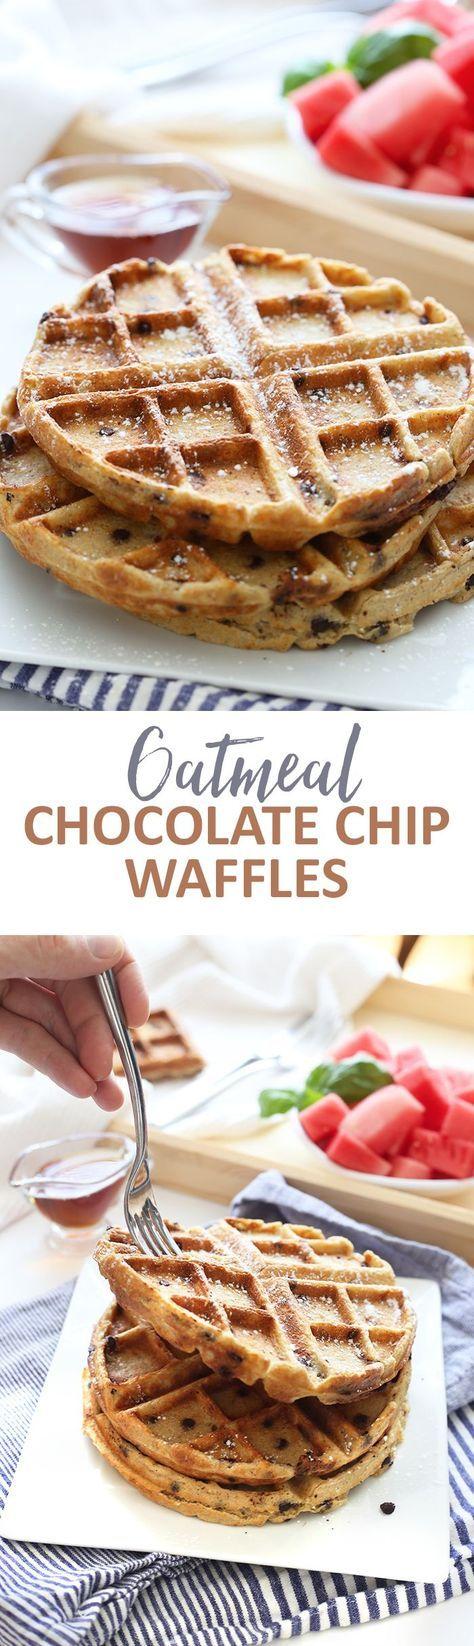 Oatmeal Chocolate Chip Waffles